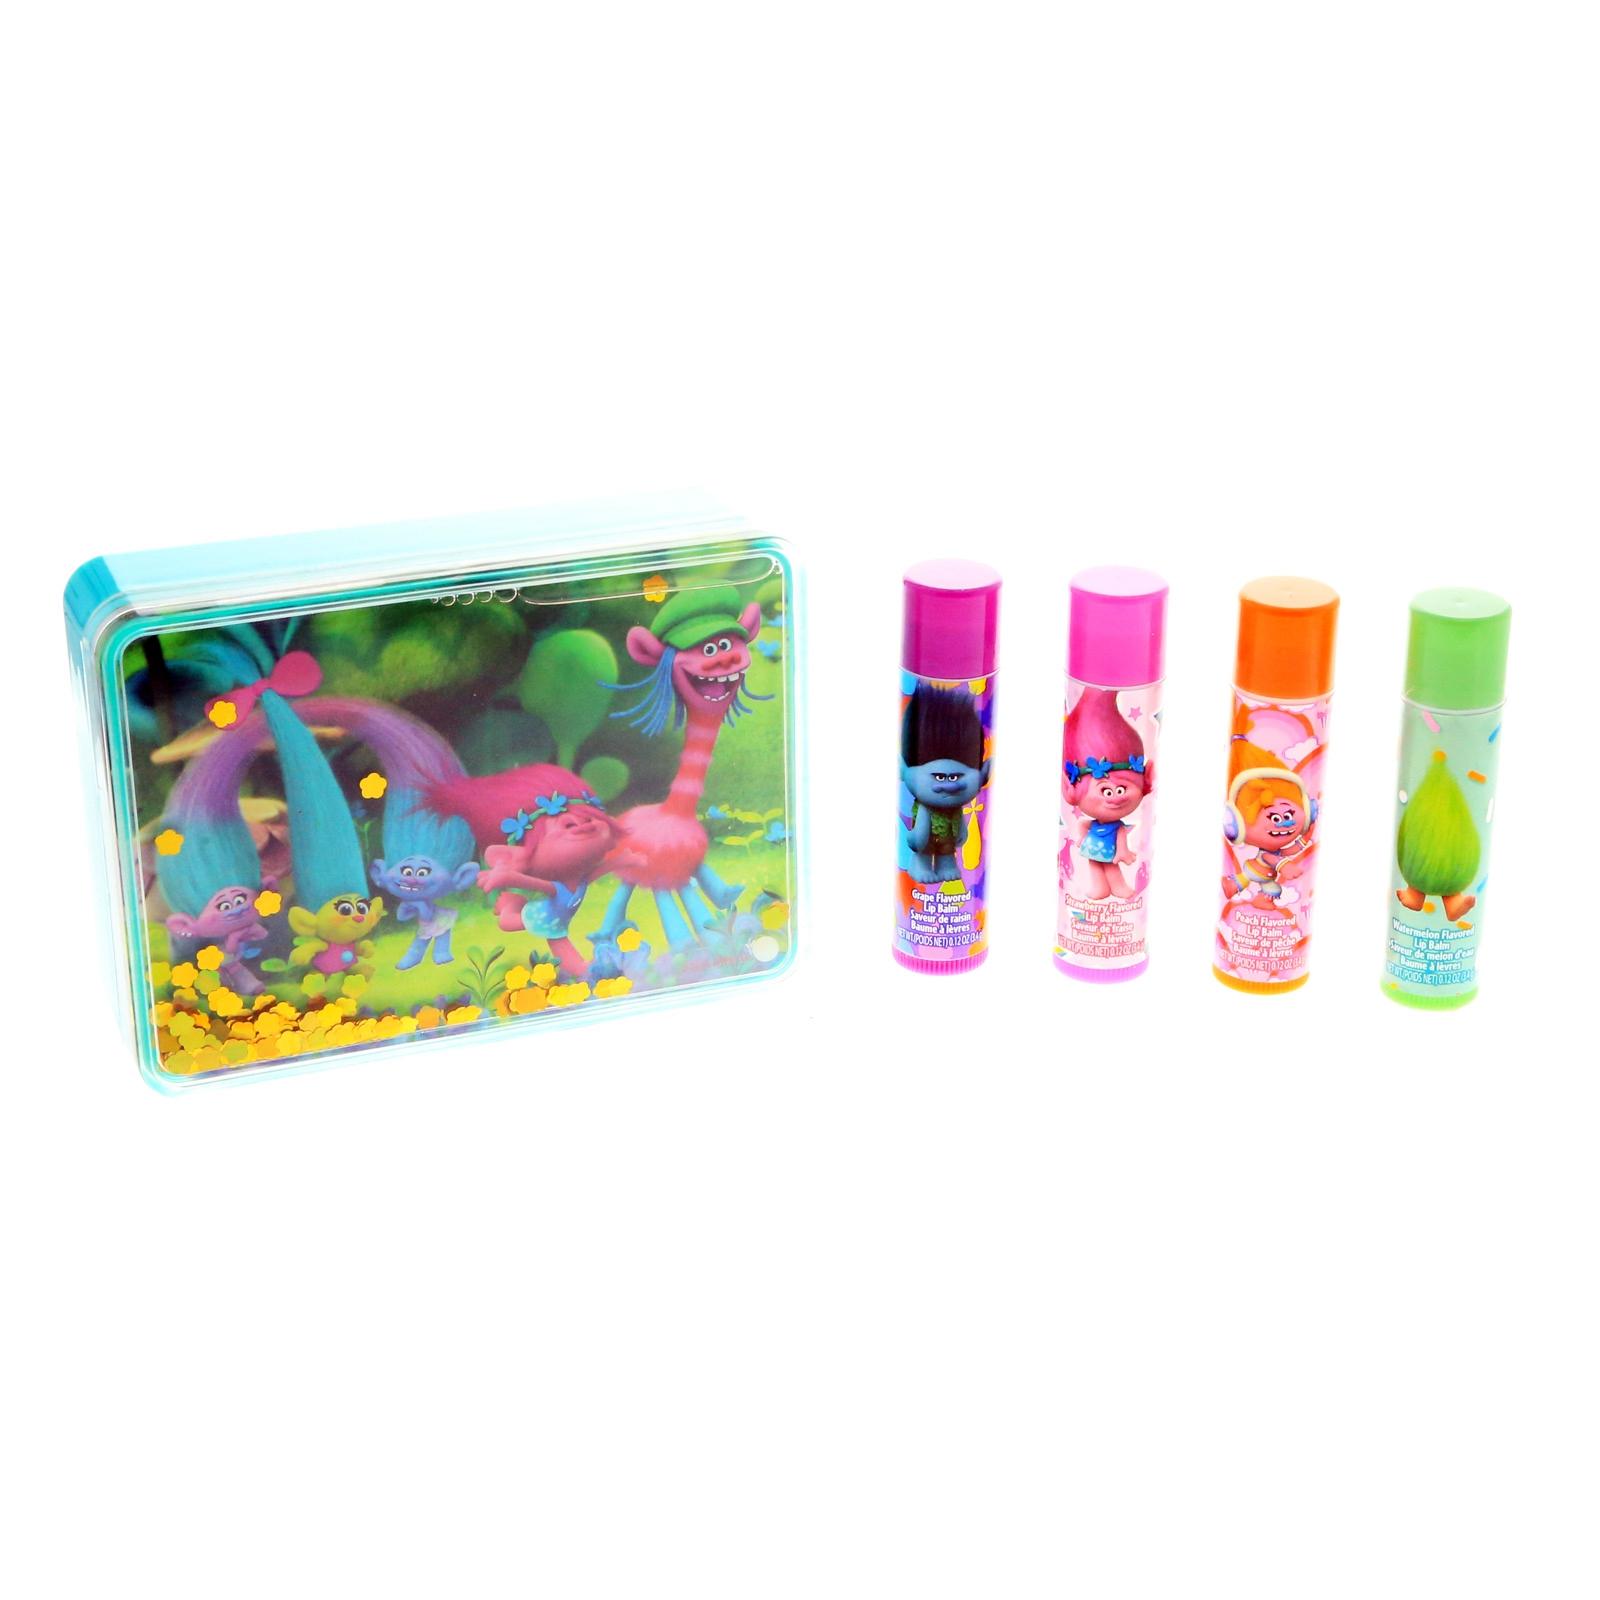 Dreamworks Trolls Girls Flavored Lip Balm Sparkle Case Cosmetic Kids Gift Set